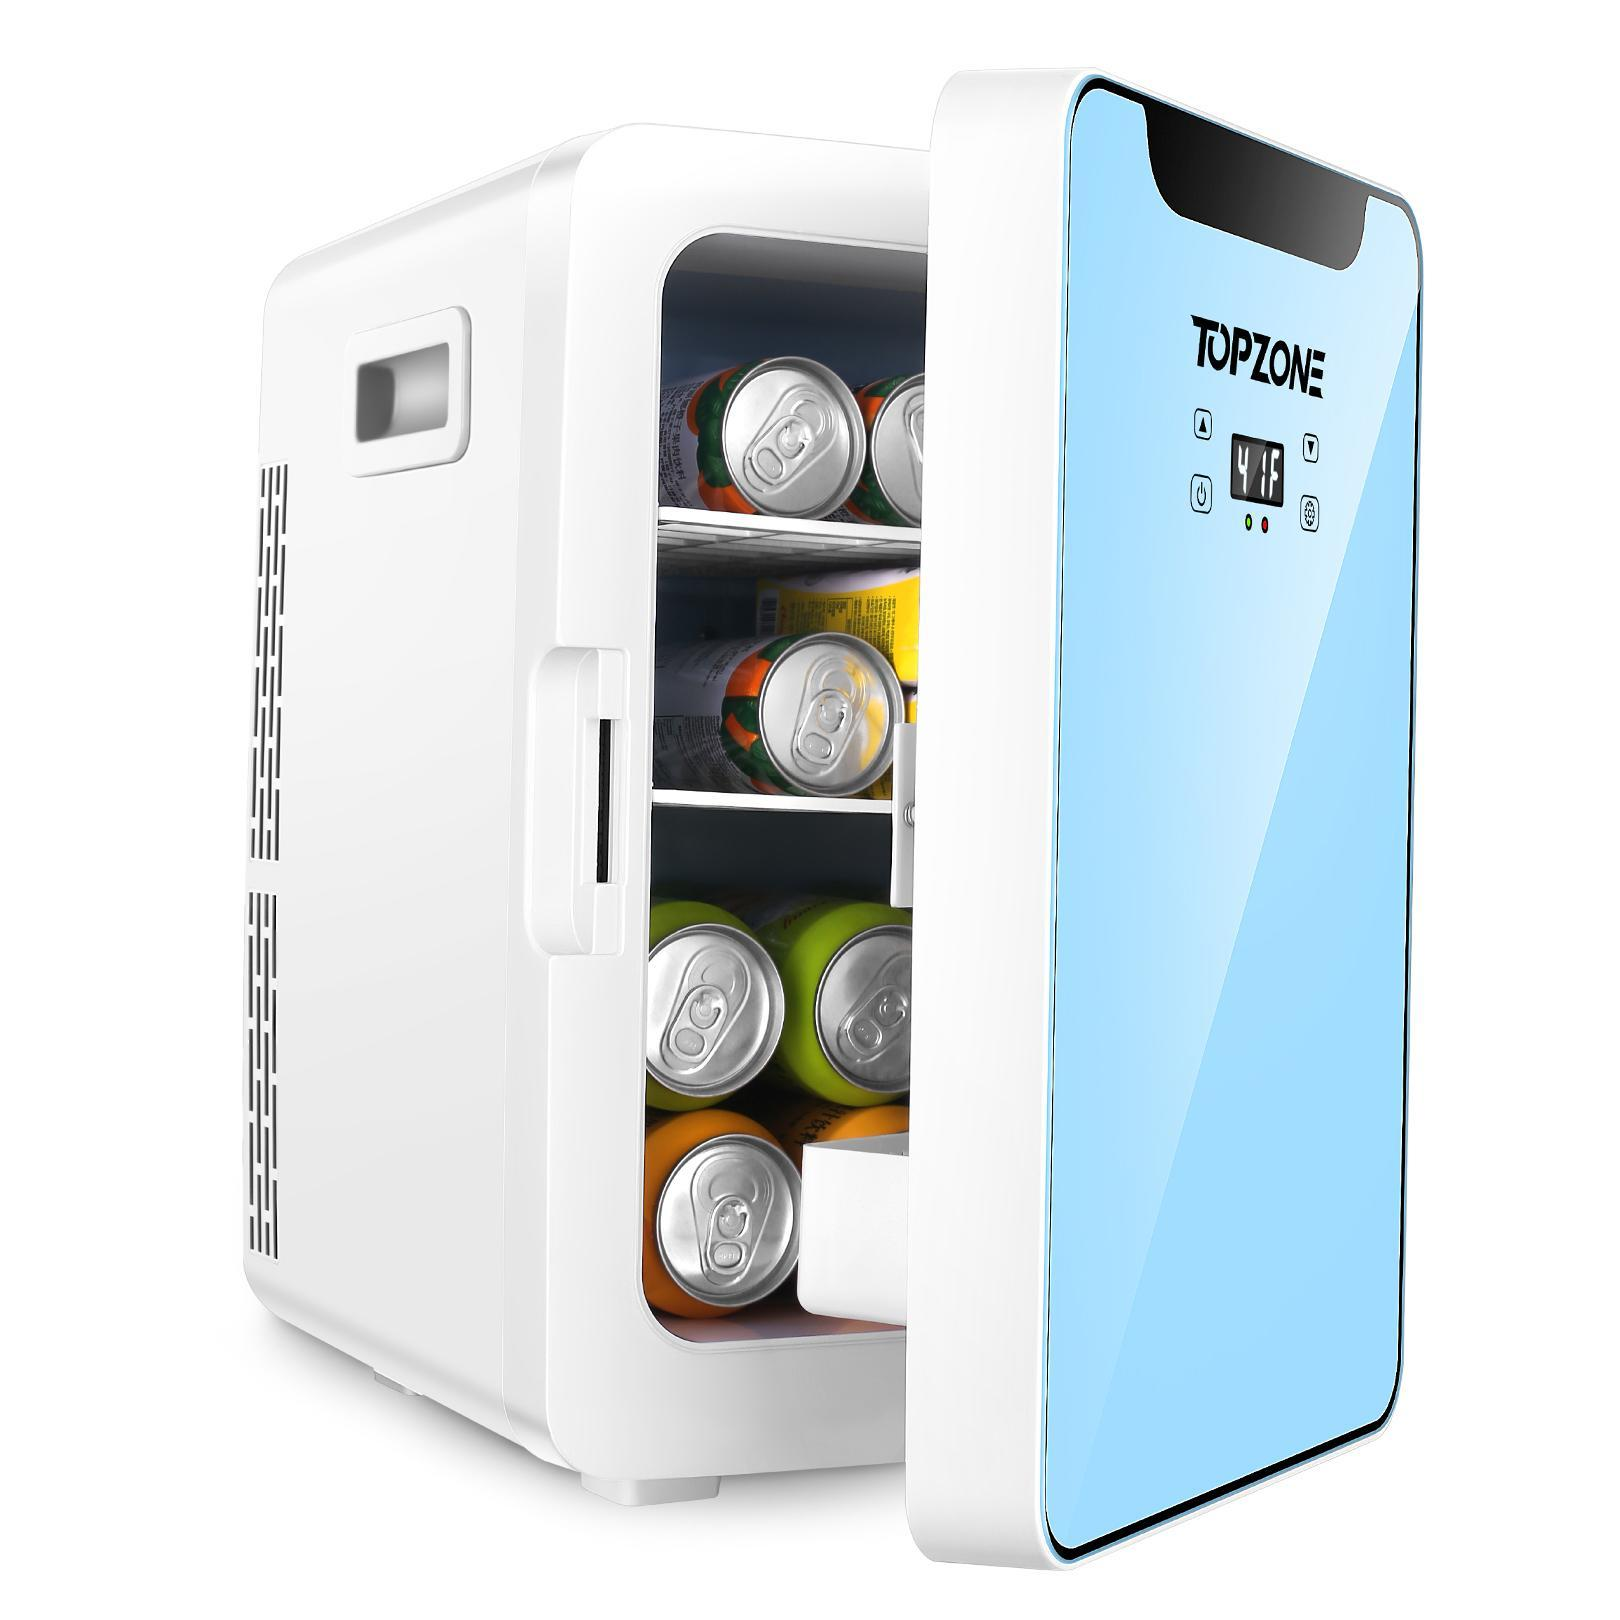 TOPZONE Portable Beverage Mini Fridge 20L  Review 2021